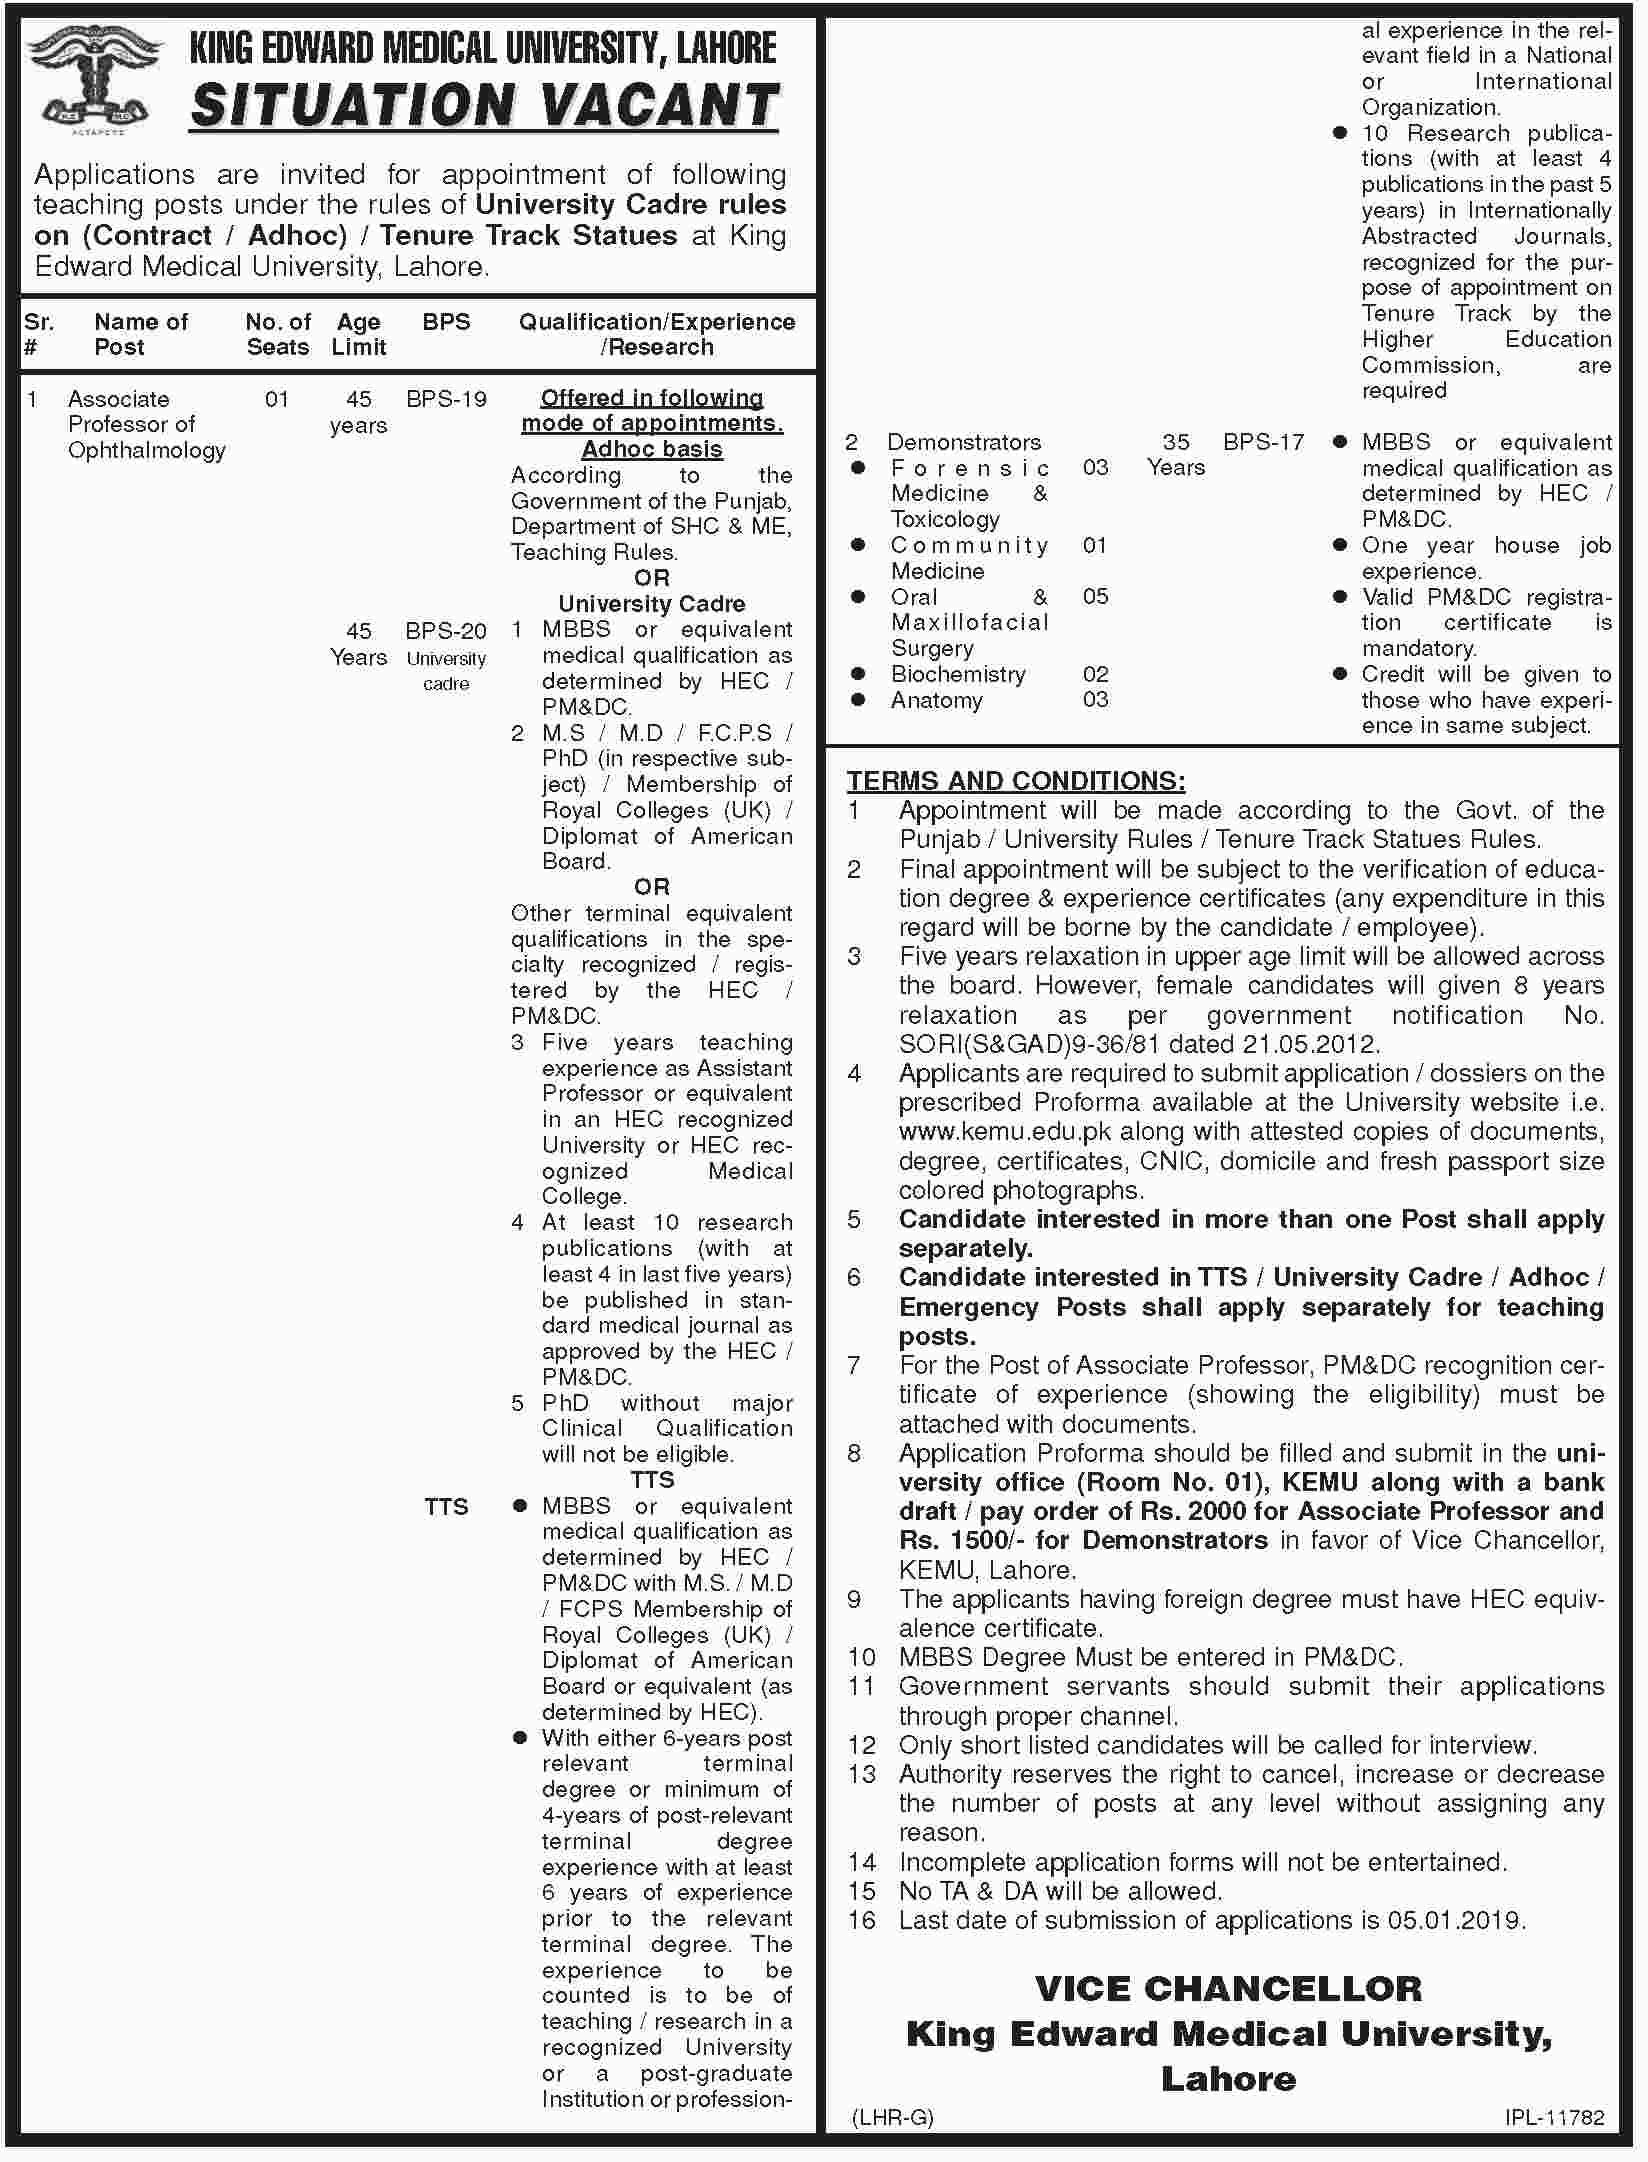 King Edward Medical University Lahore KEMU 28 Dec 2018 Jobs